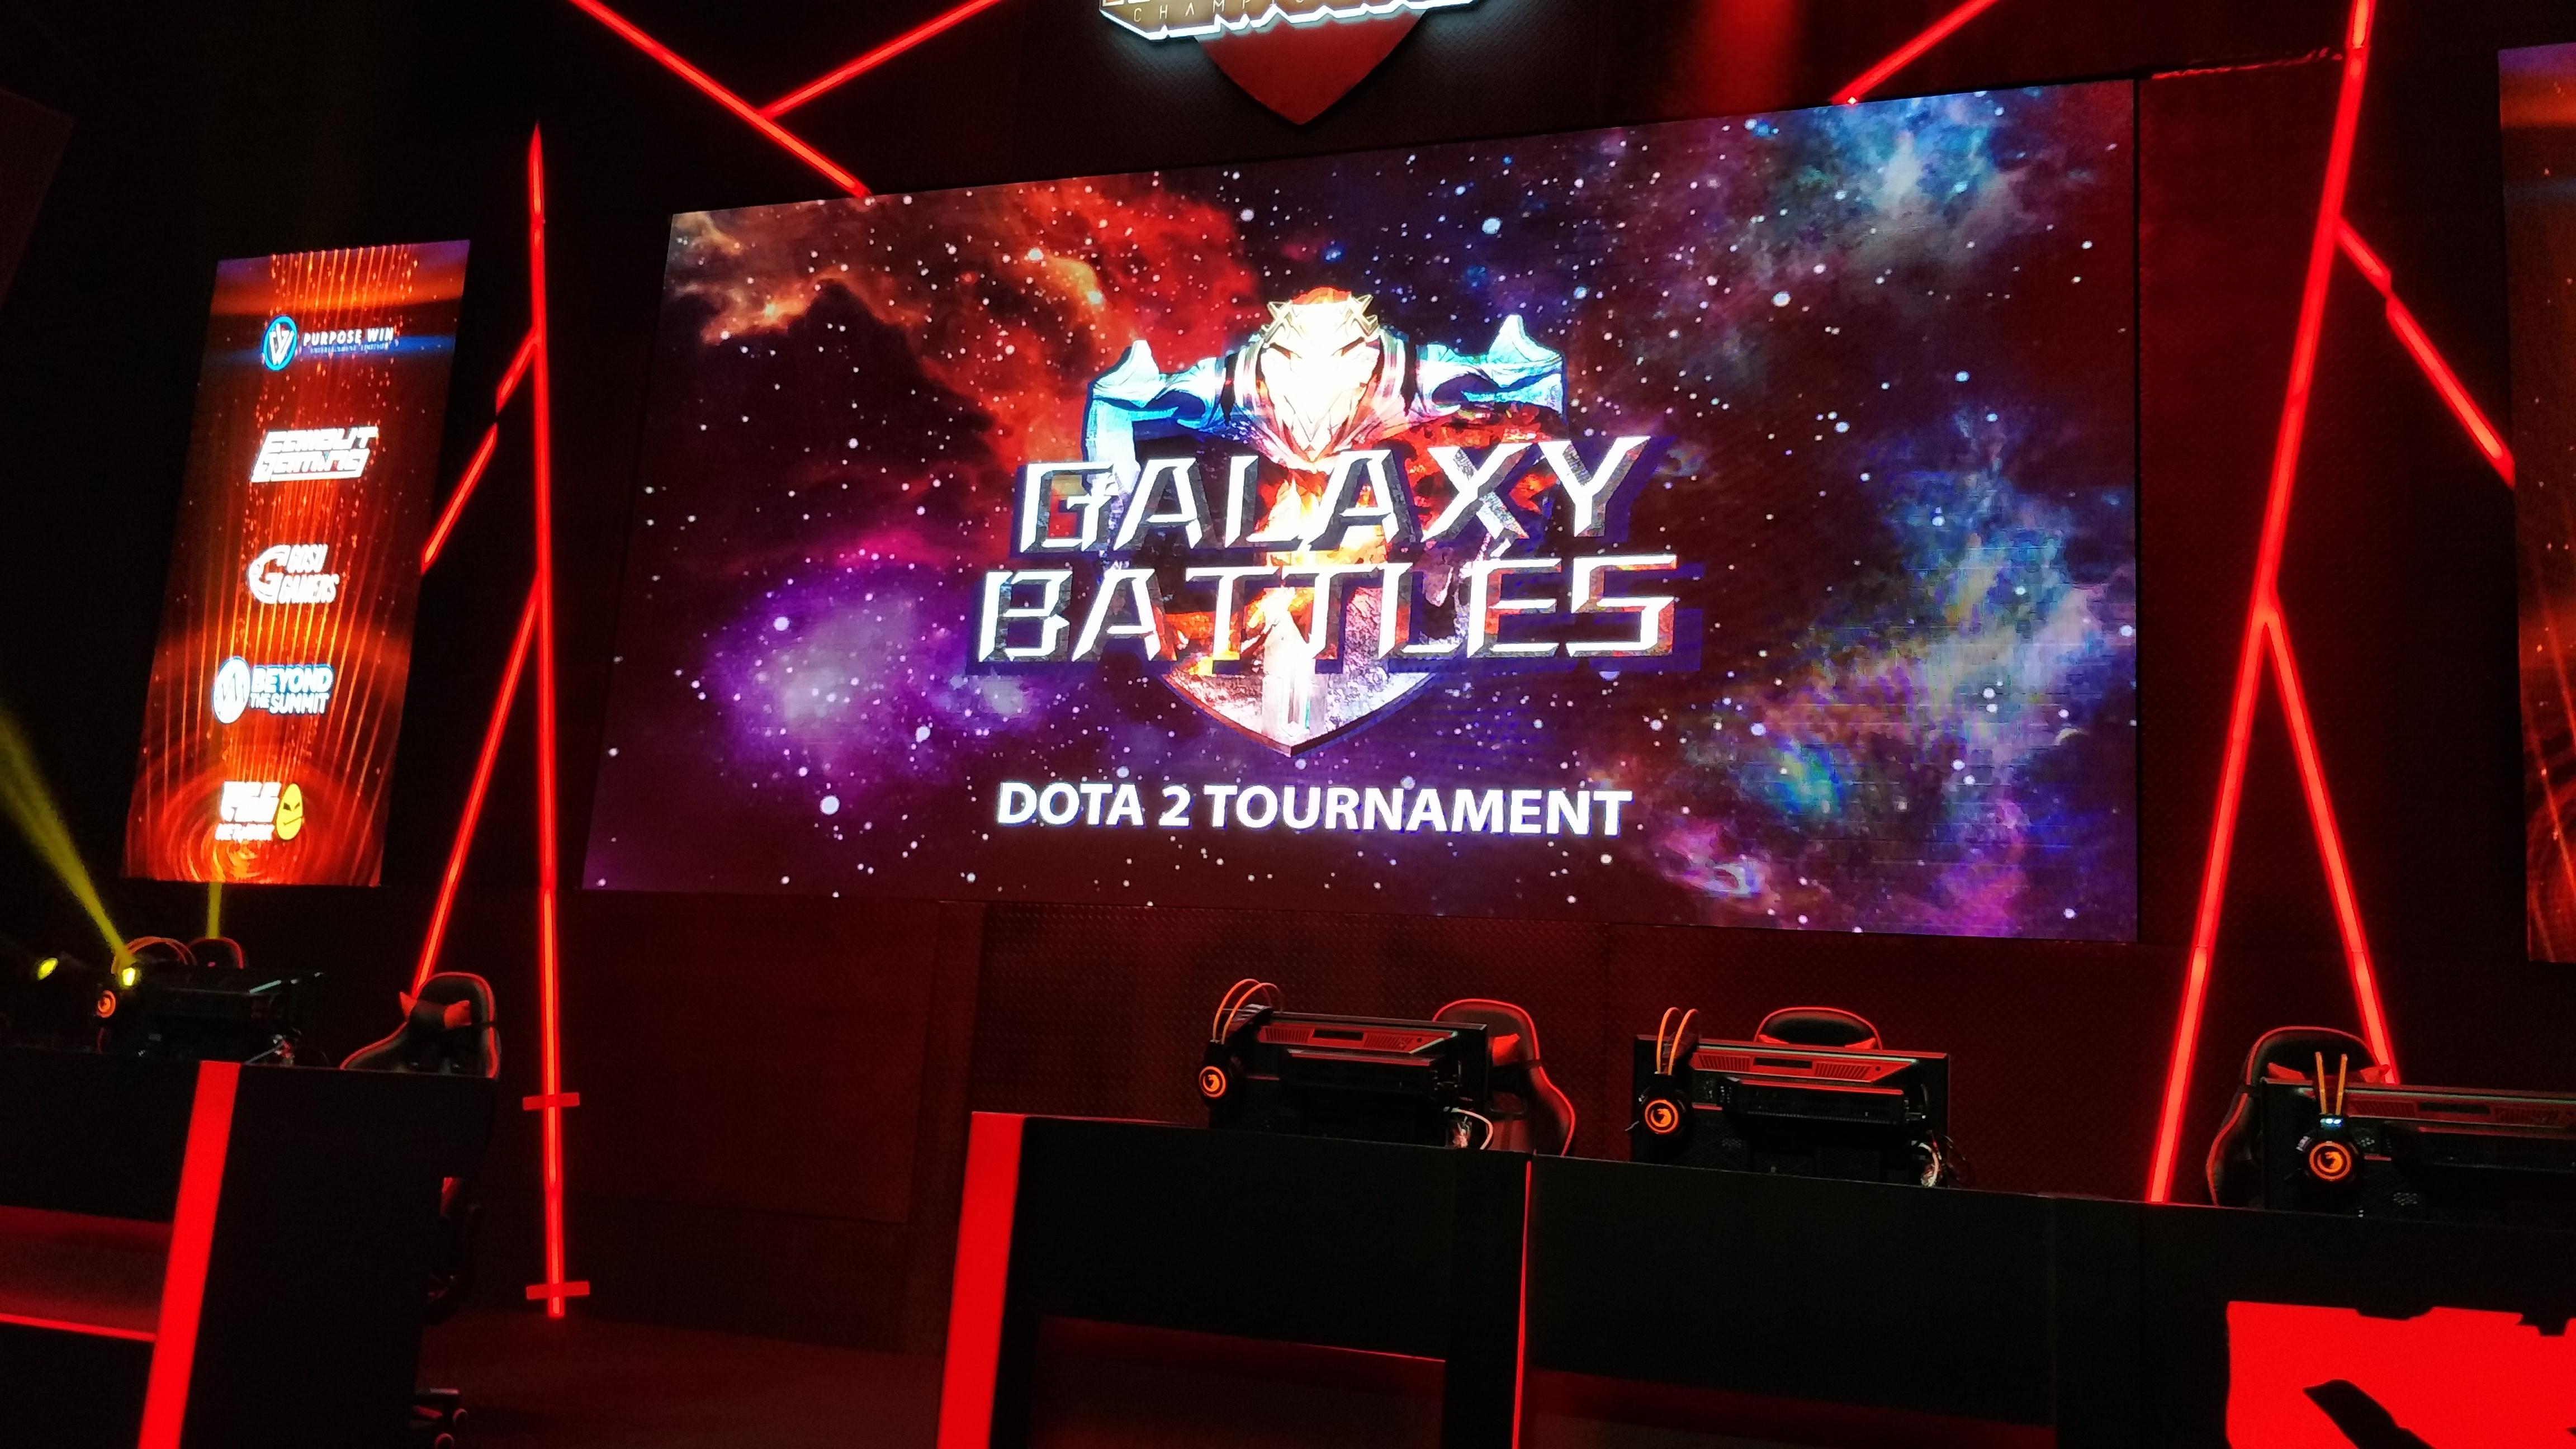 Galaxy battles press conference